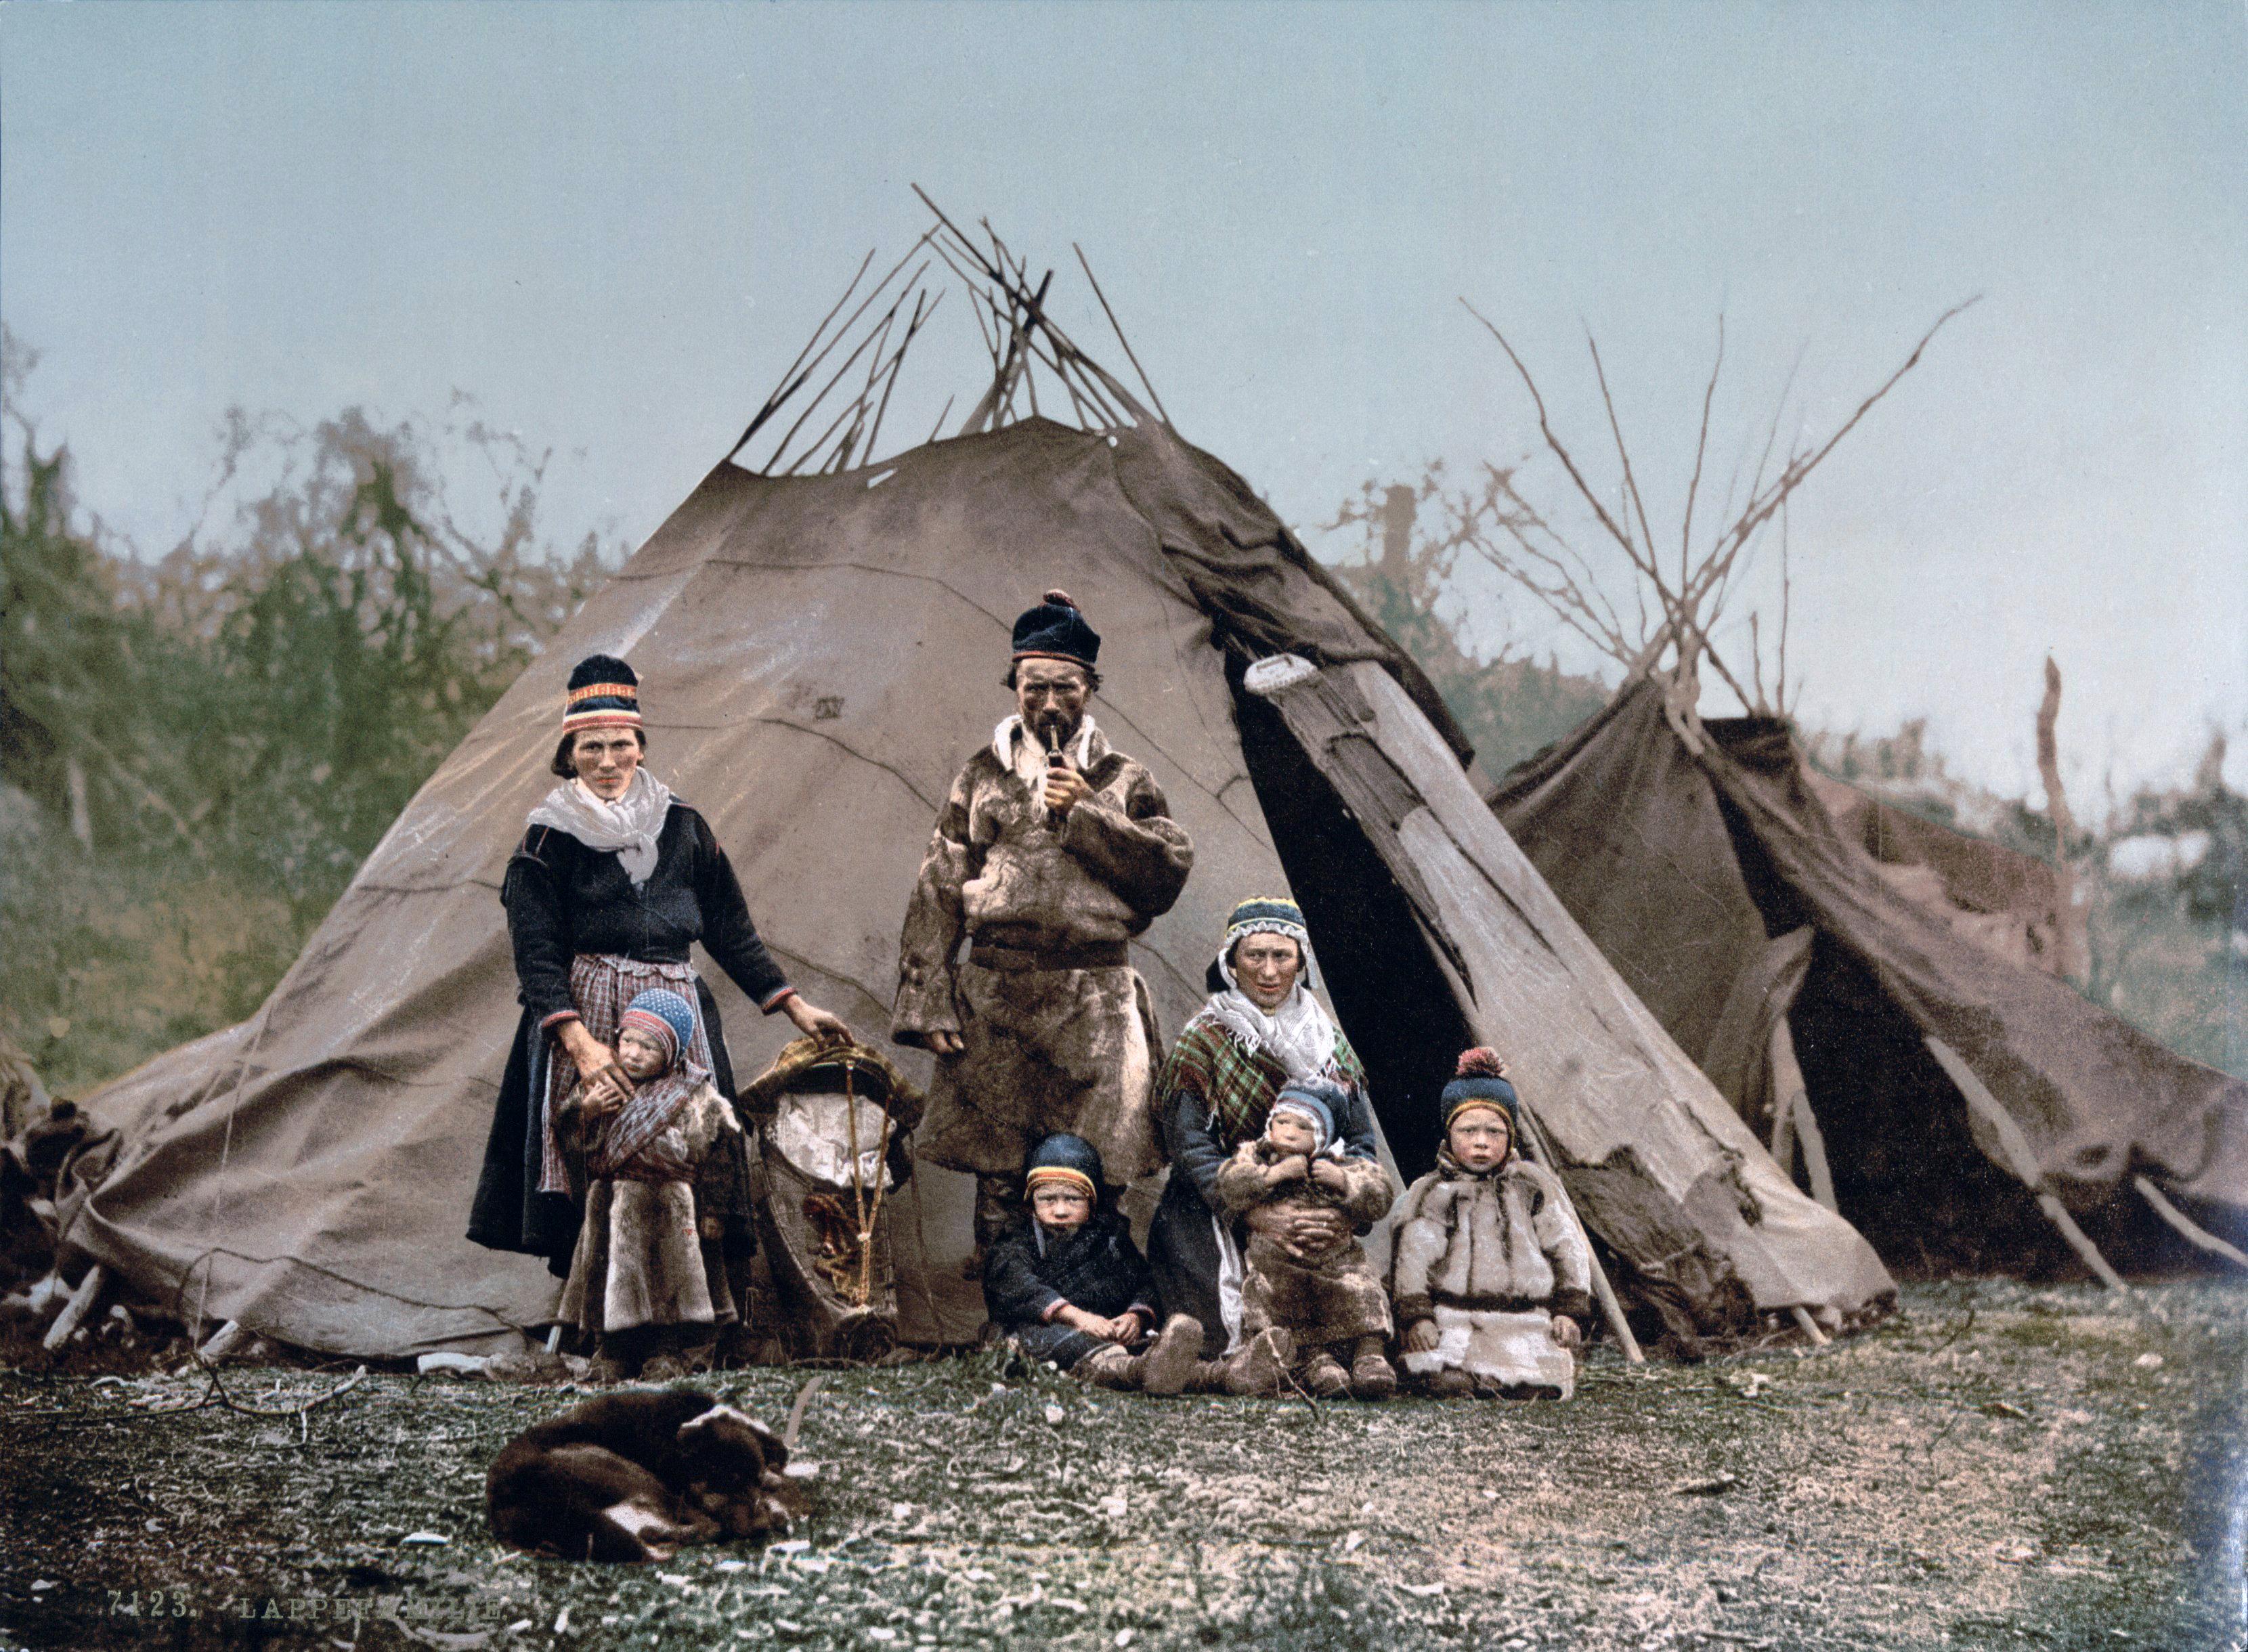 http://upload.wikimedia.org/wikipedia/commons/8/87/Saami_Family_1900.jpg